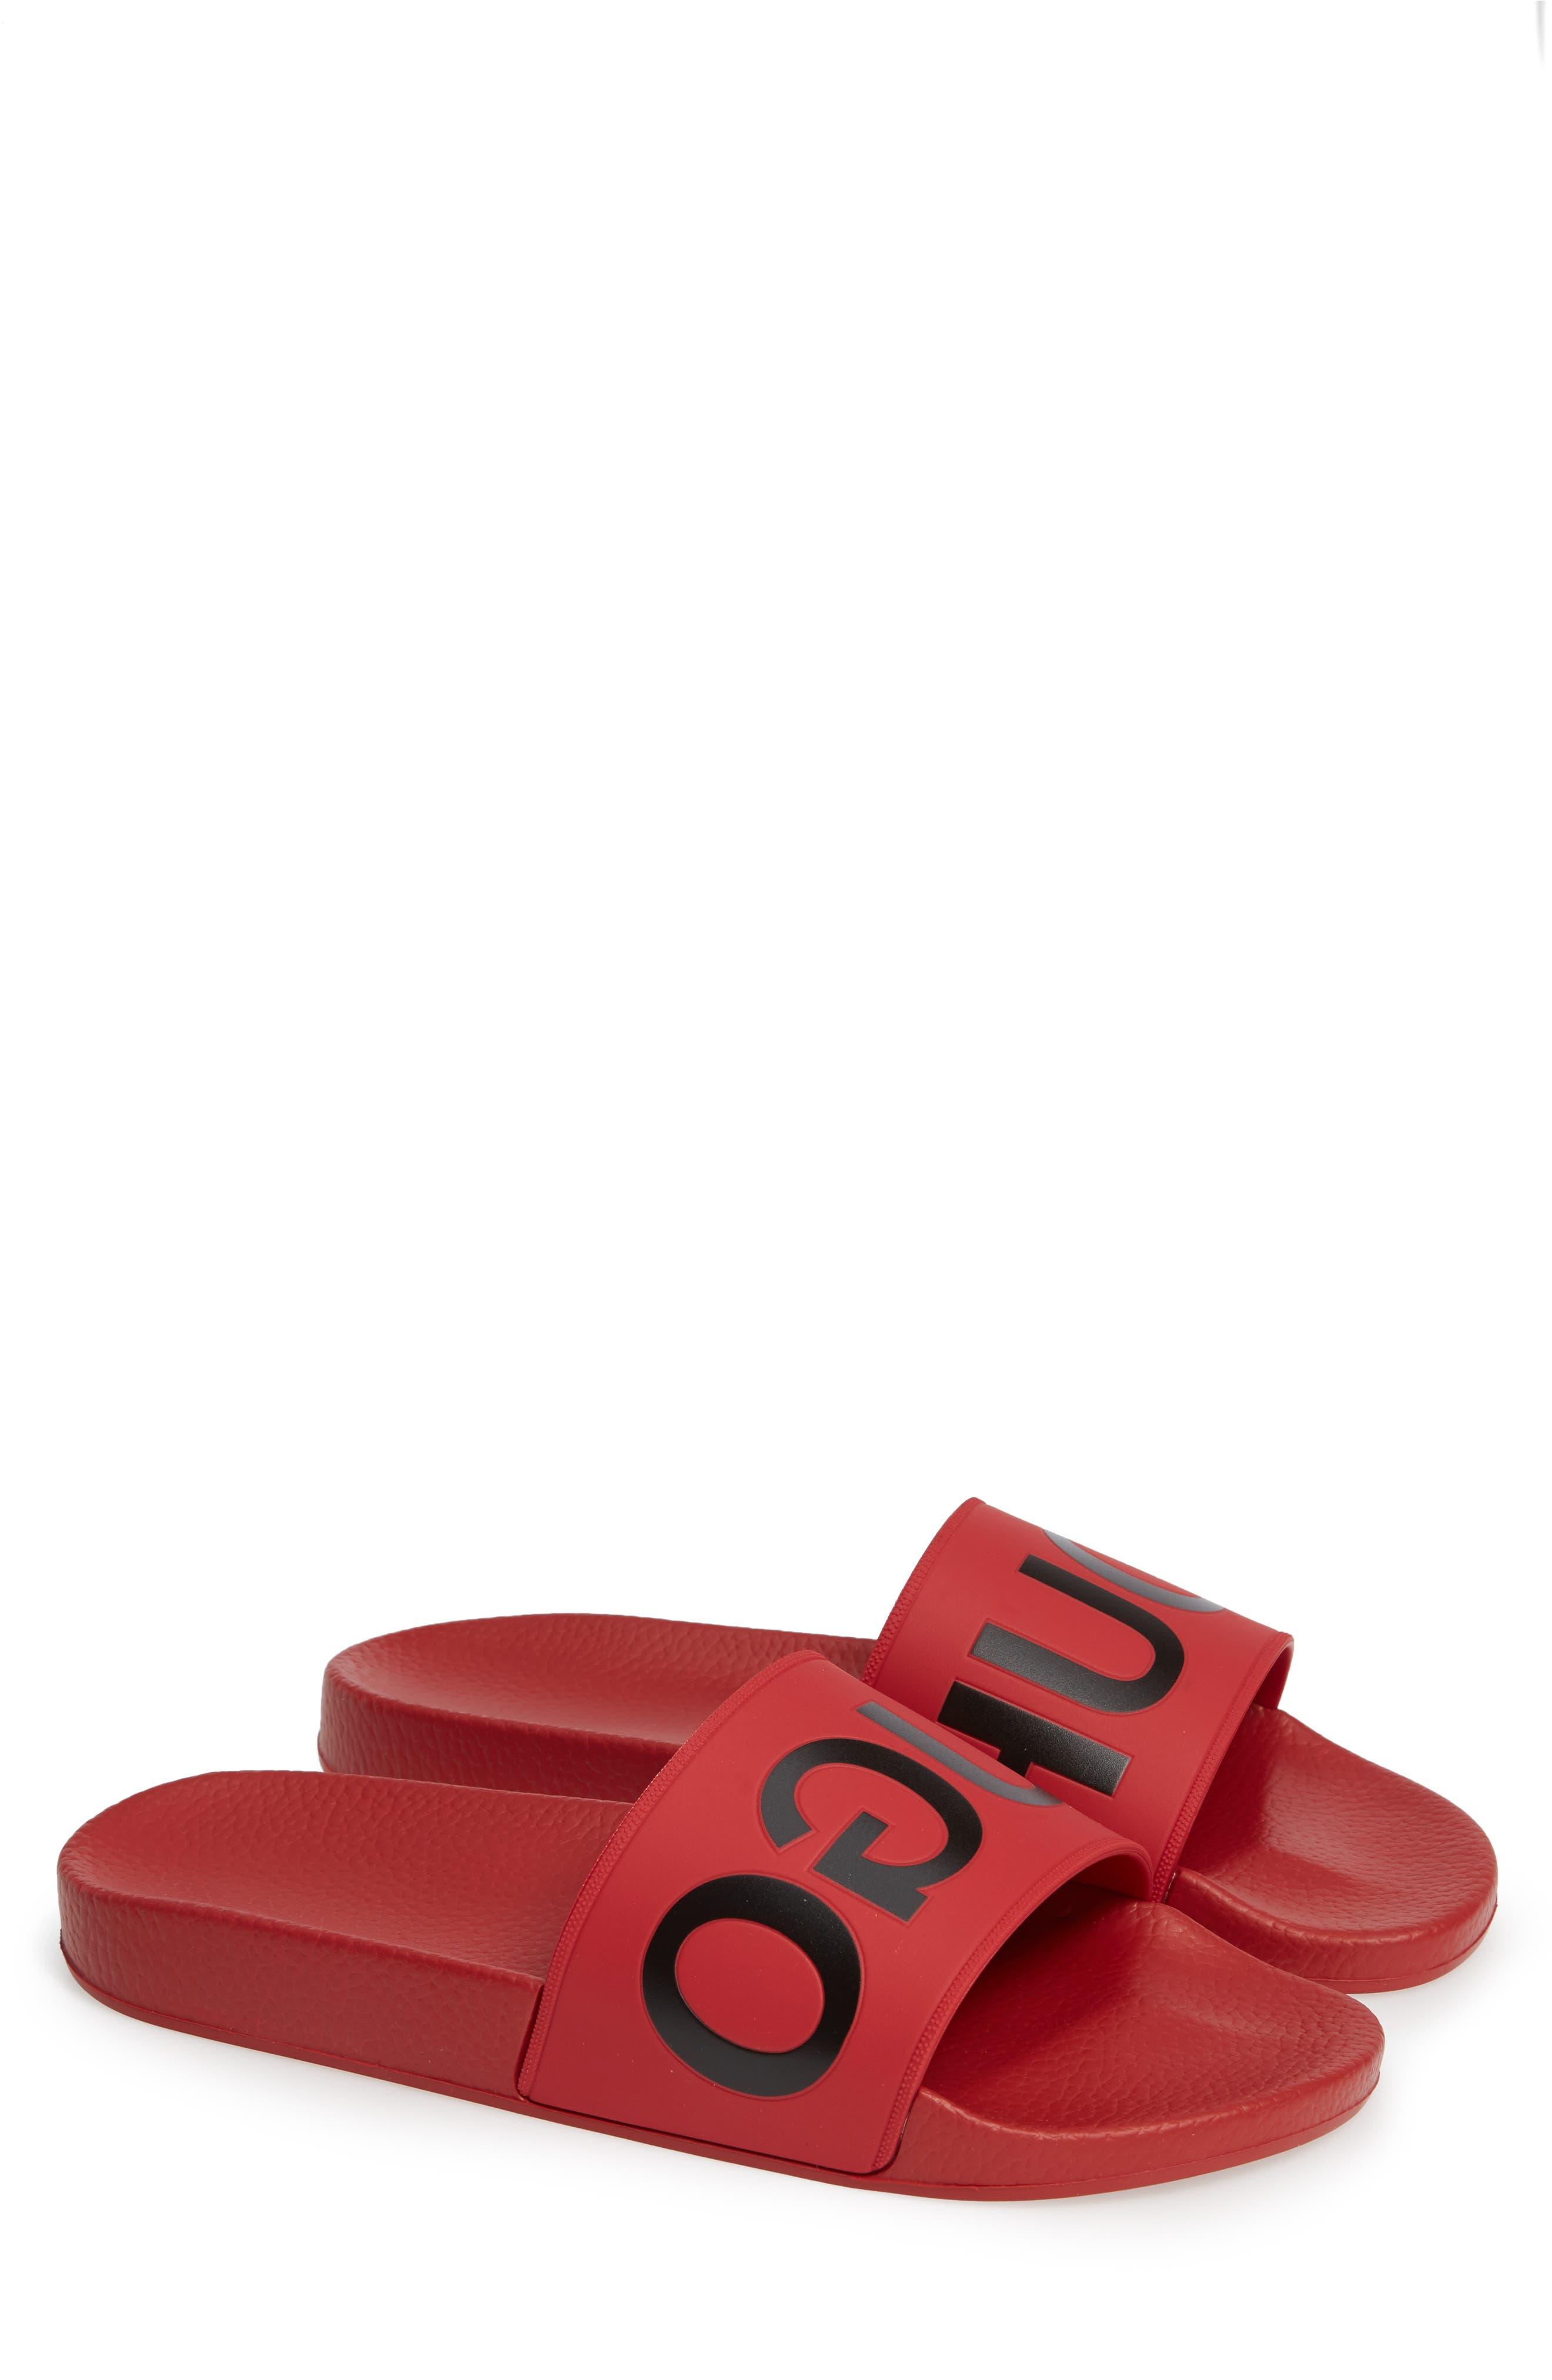 Time Out Slide Sandal,                         Main,                         color, MEDIUM RED